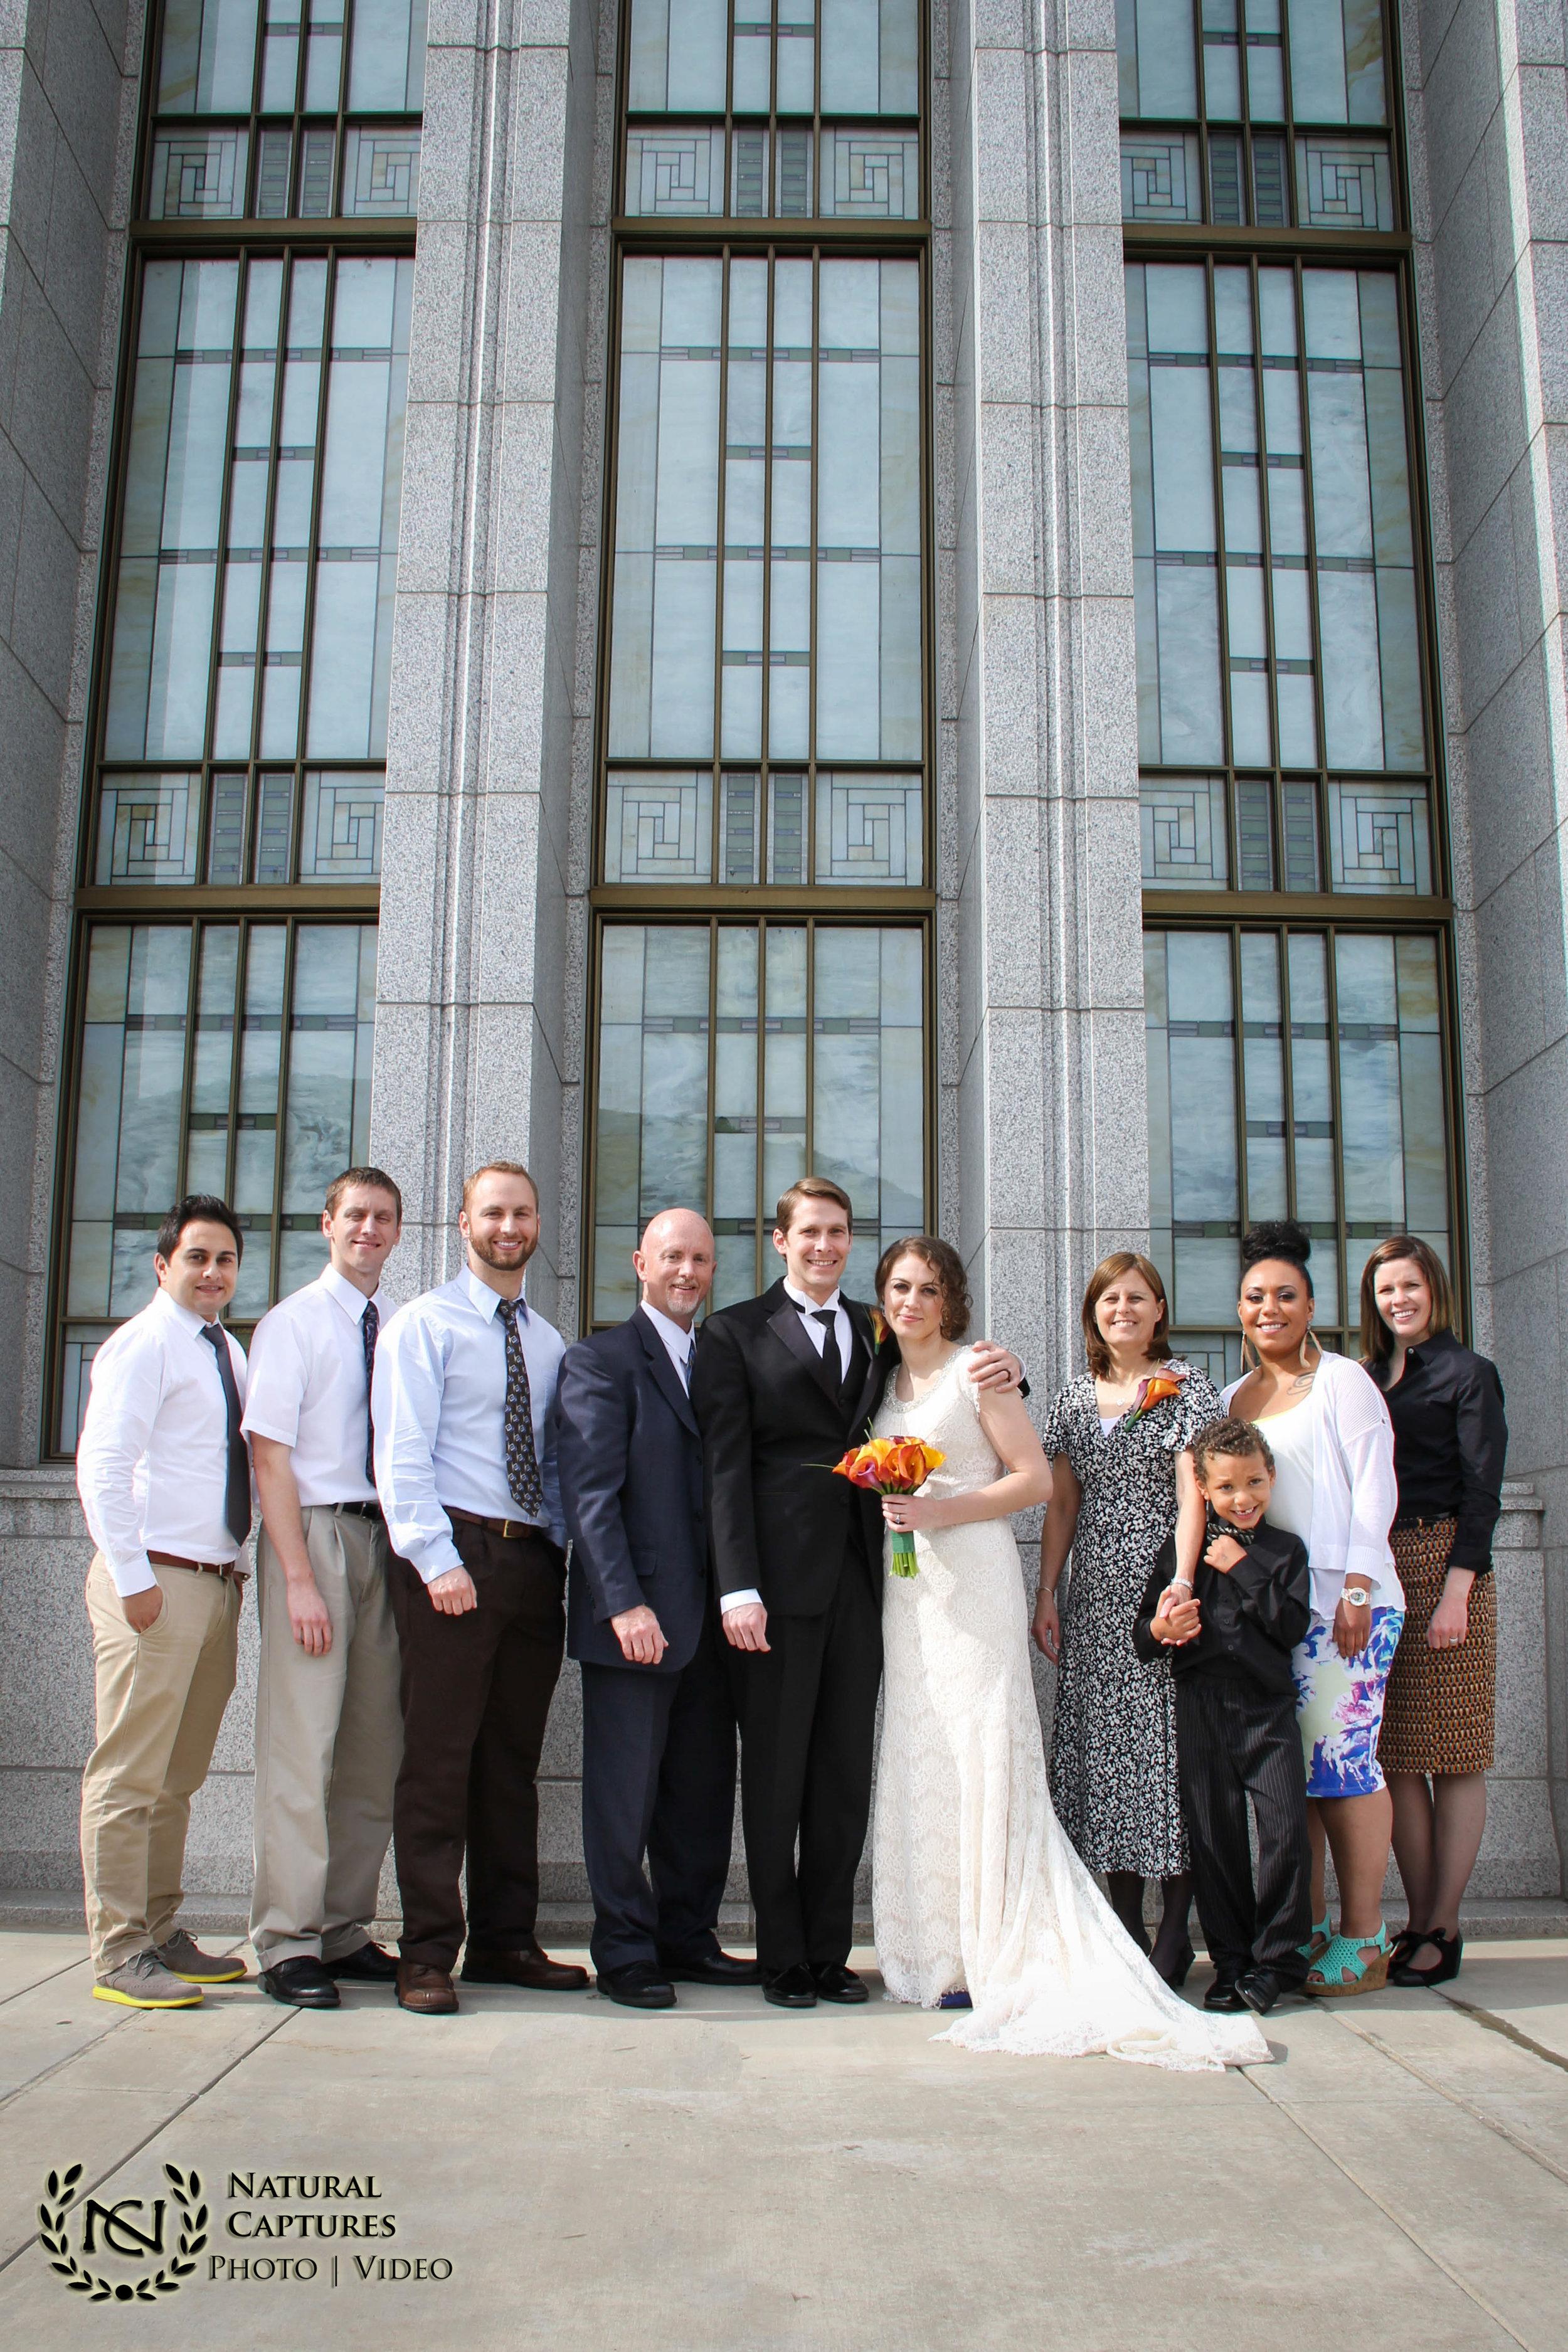 Draper Utah Temple Wedding Photography (5 of 12)